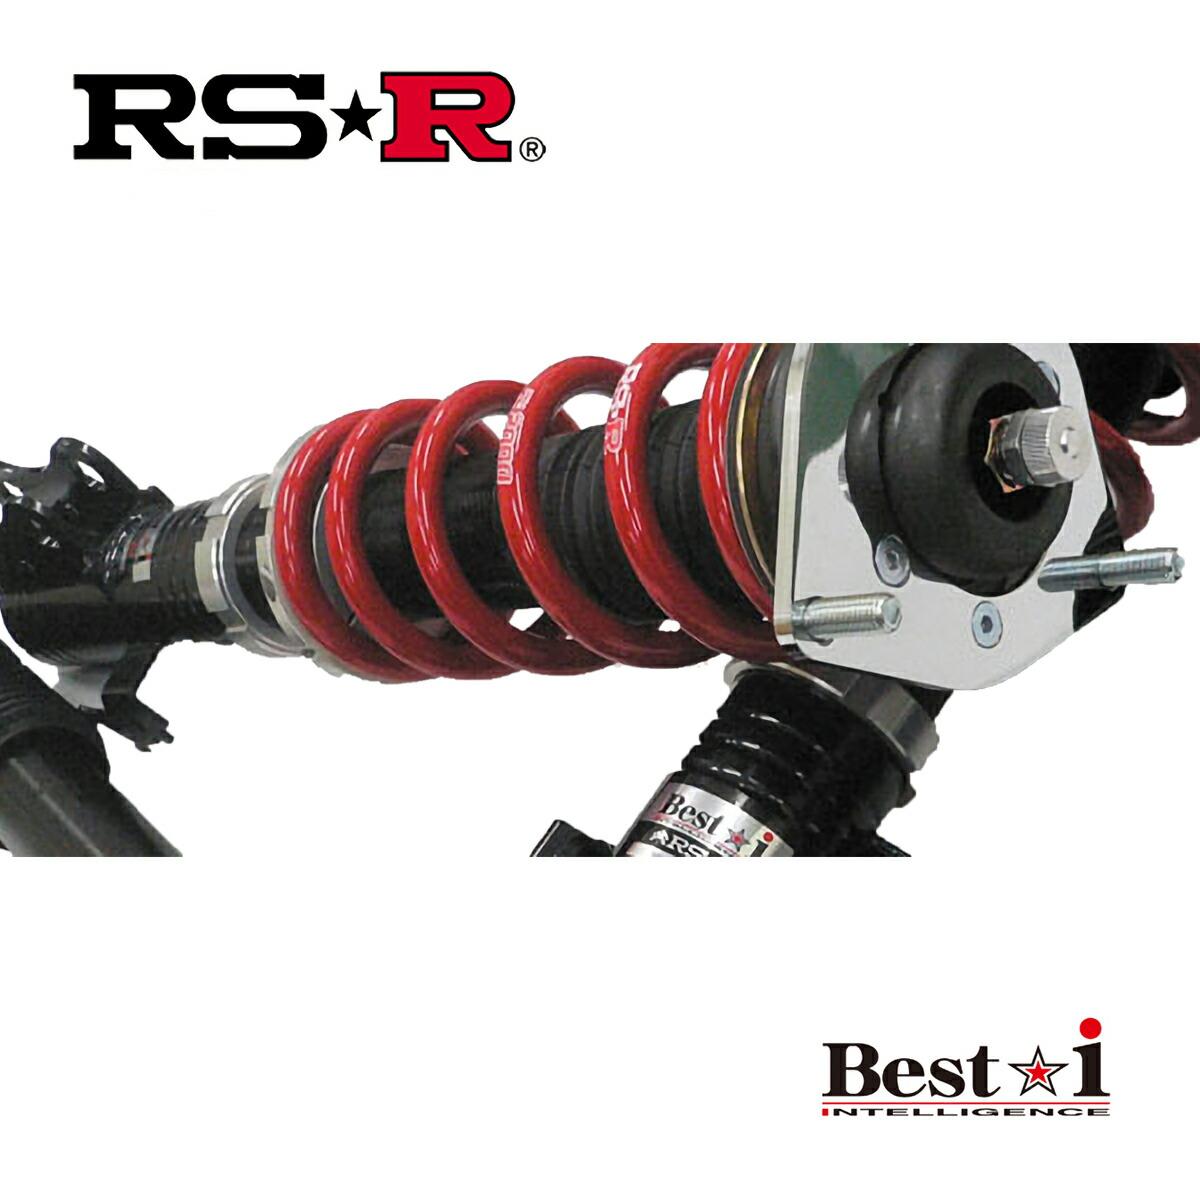 RS-R クラウン GRS201 アスリート i-Four 車高調 リア車高調整:全長式 LIT291M ベストi RSR 個人宅発送追金有